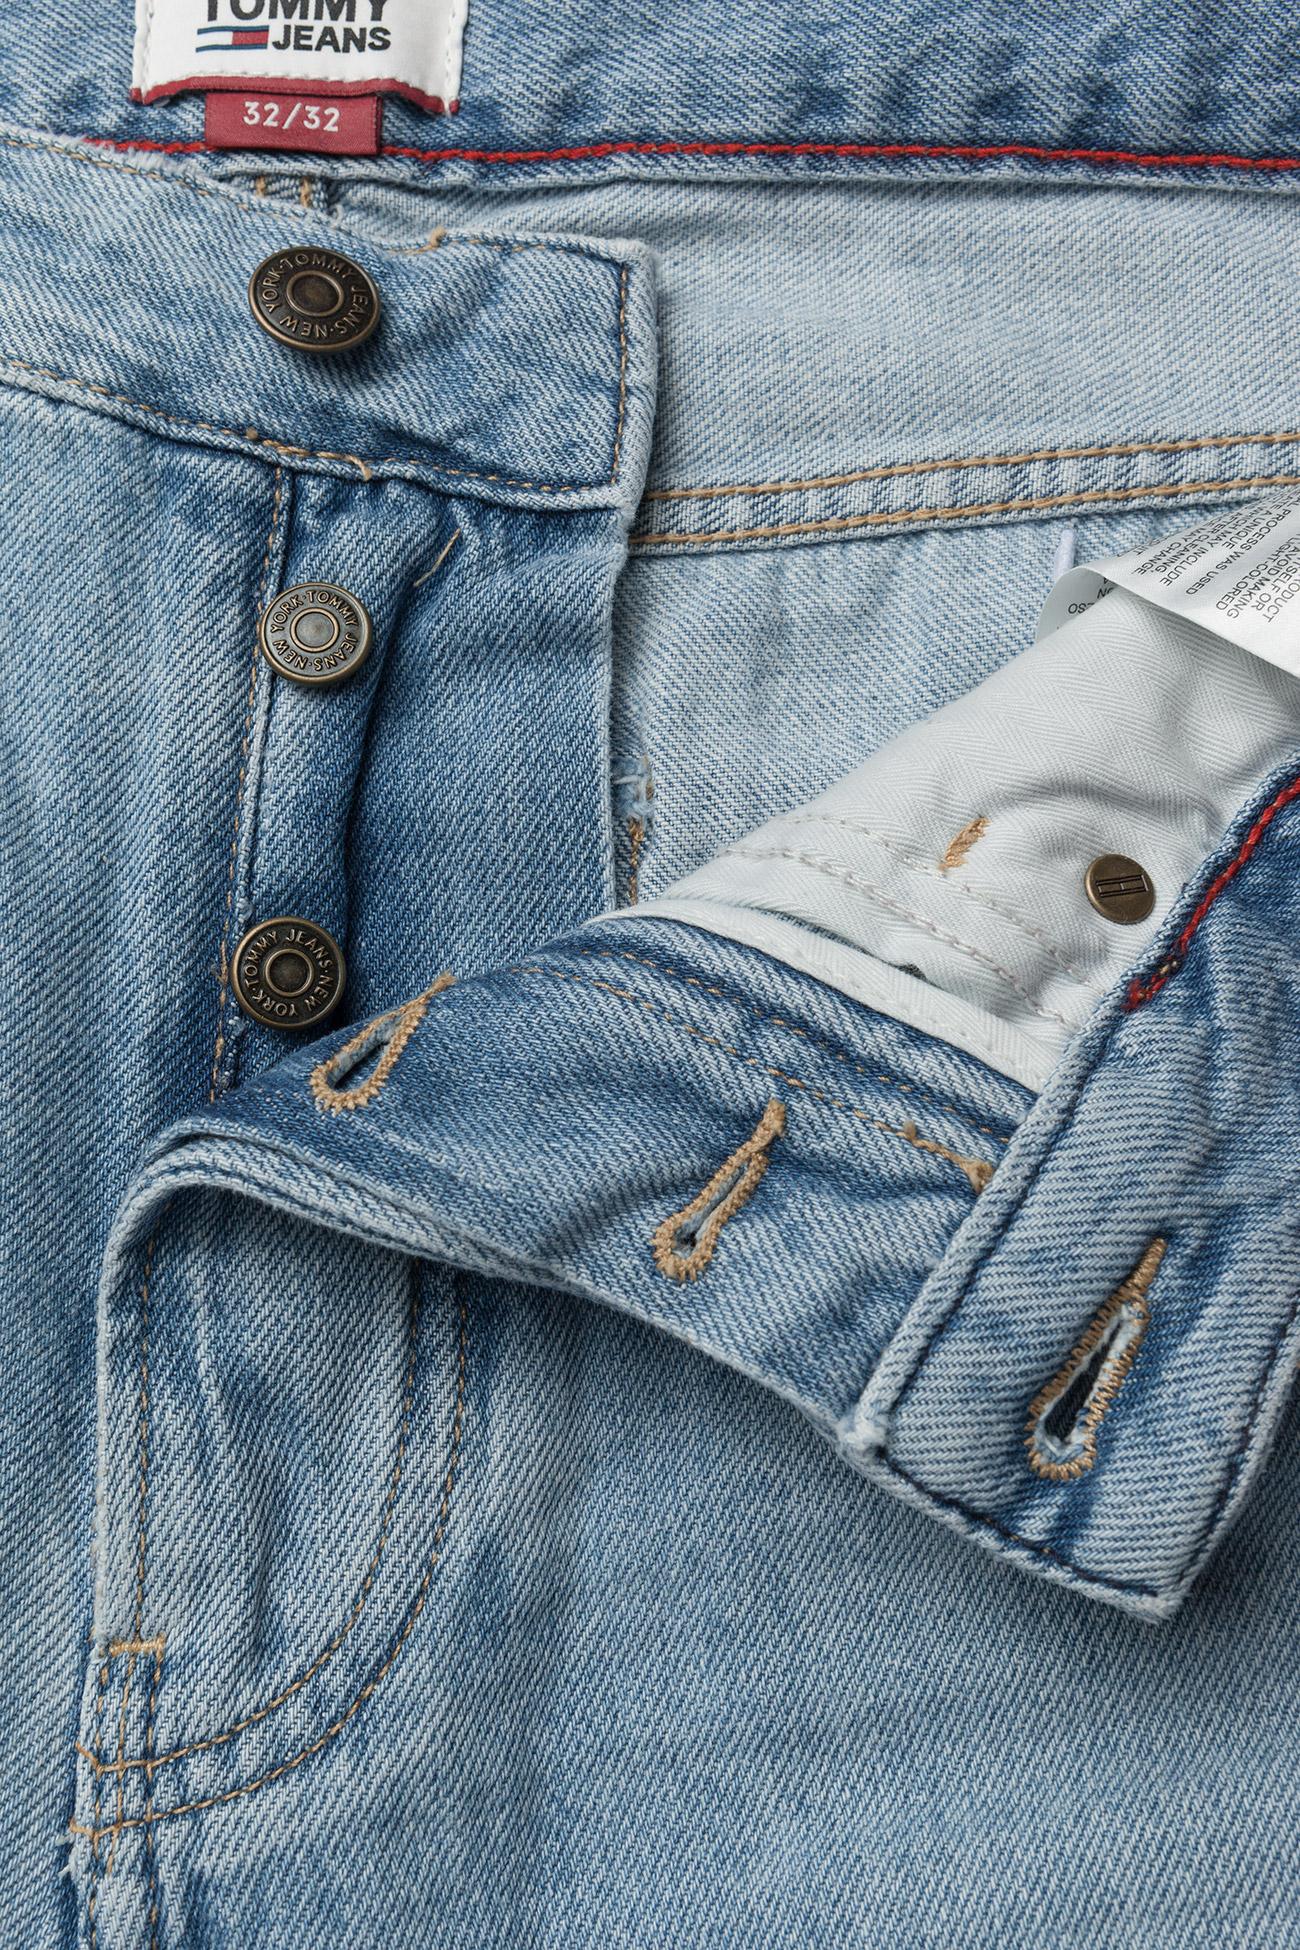 Relaxed RigidTommy Blue Light Malbrimason Tj Baggy 1951 Jeans 354RAjL